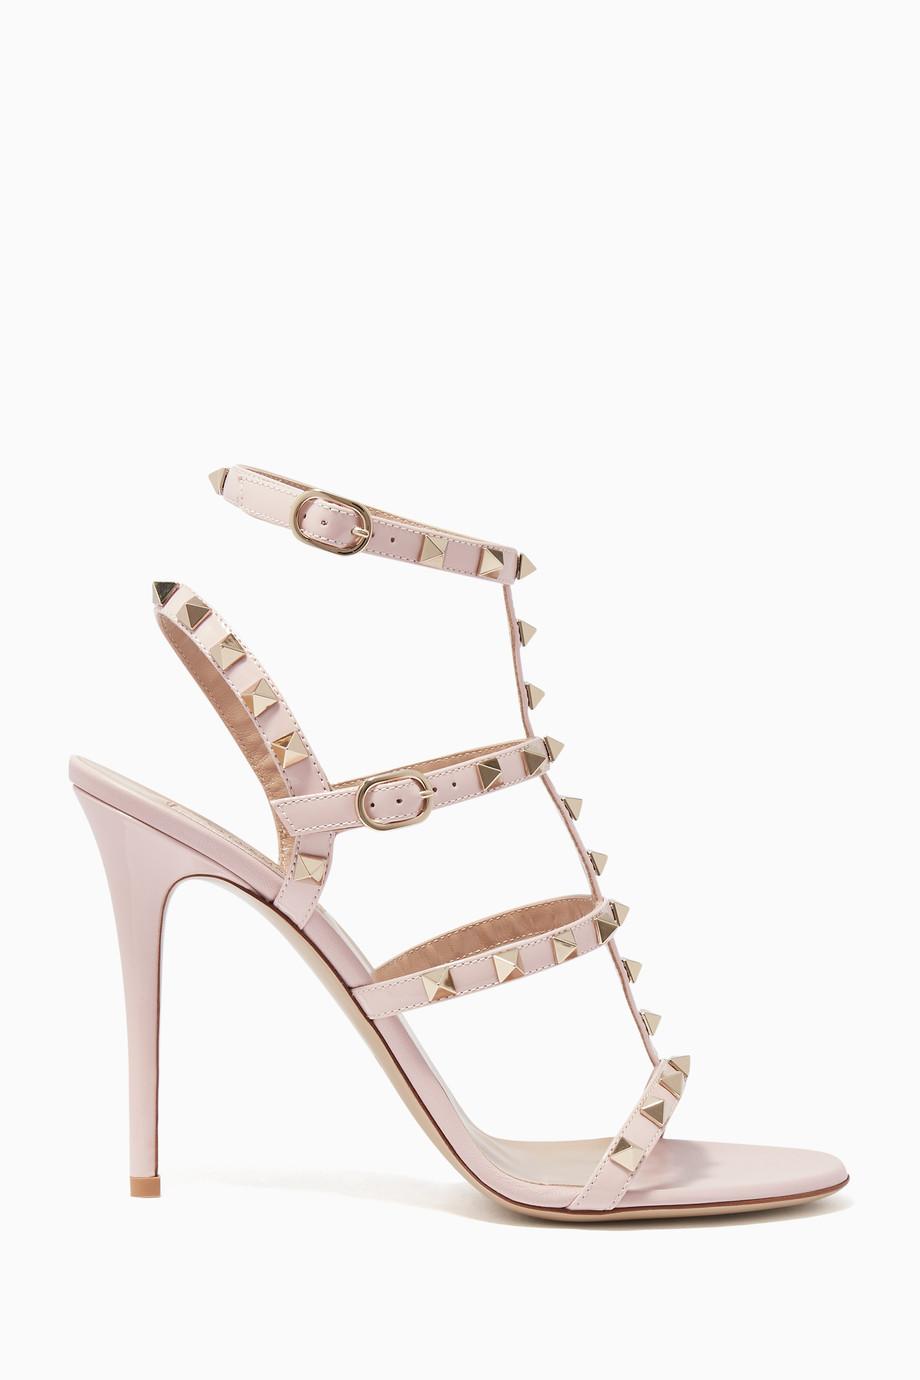 42c5f4ab4888 Shop Valentino Pink Light-Pink Rockstud Ankle Strap Patent Sandals ...